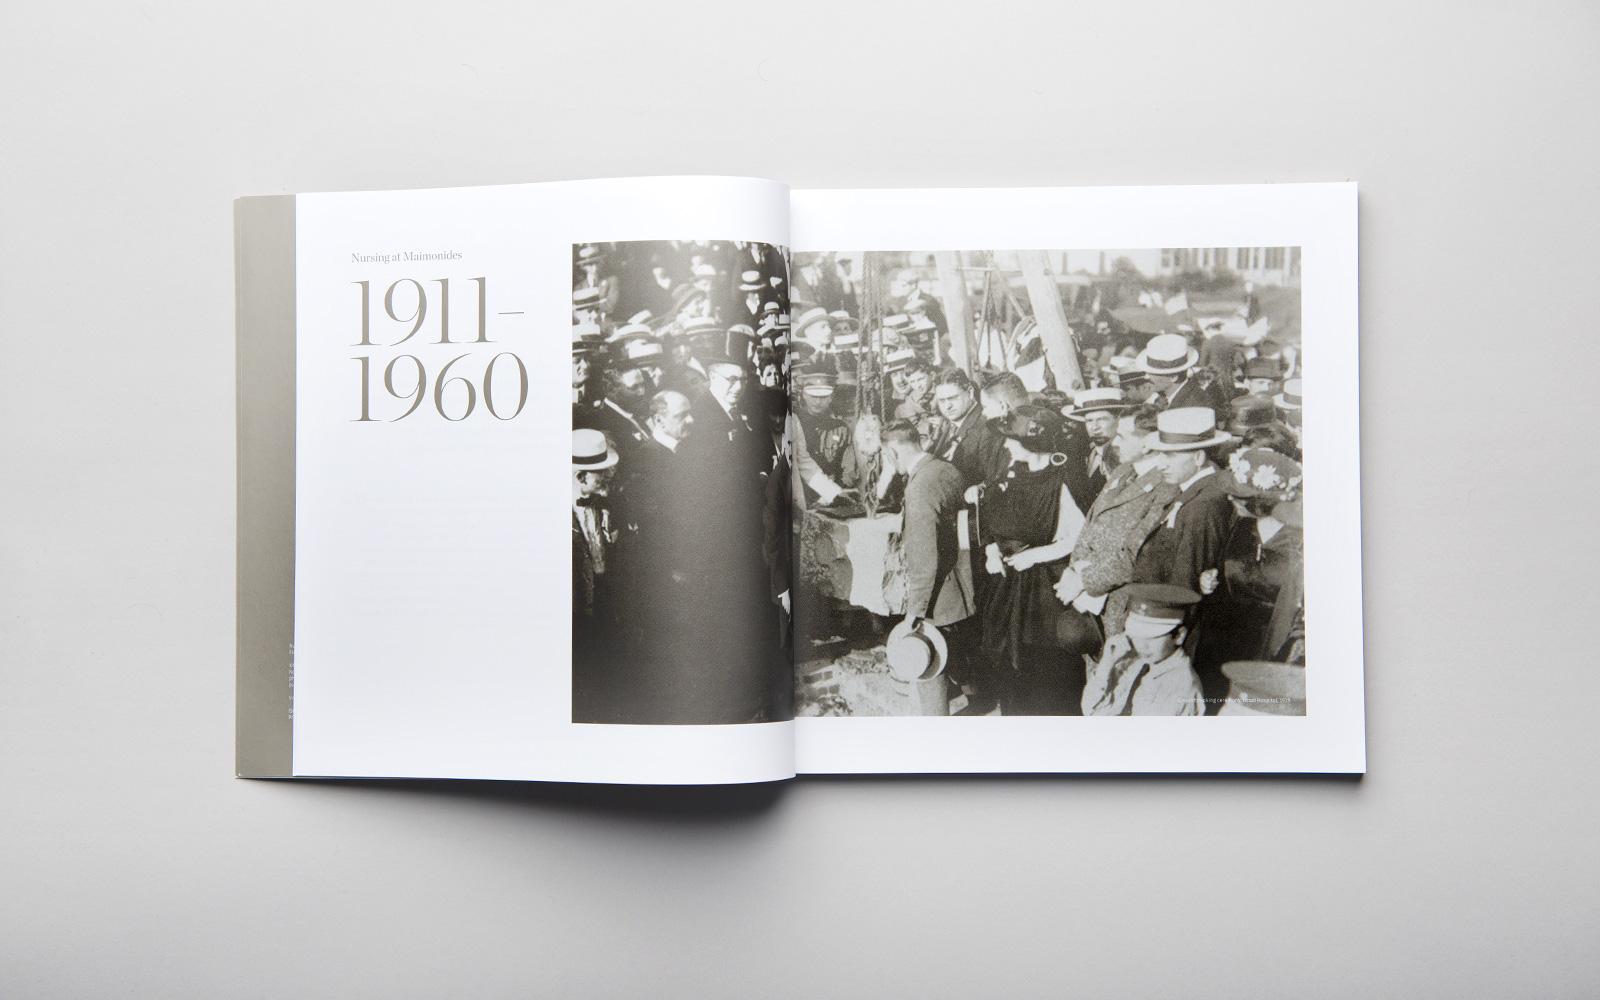 Nursing Centennial Book - 1911–1960 Introduction